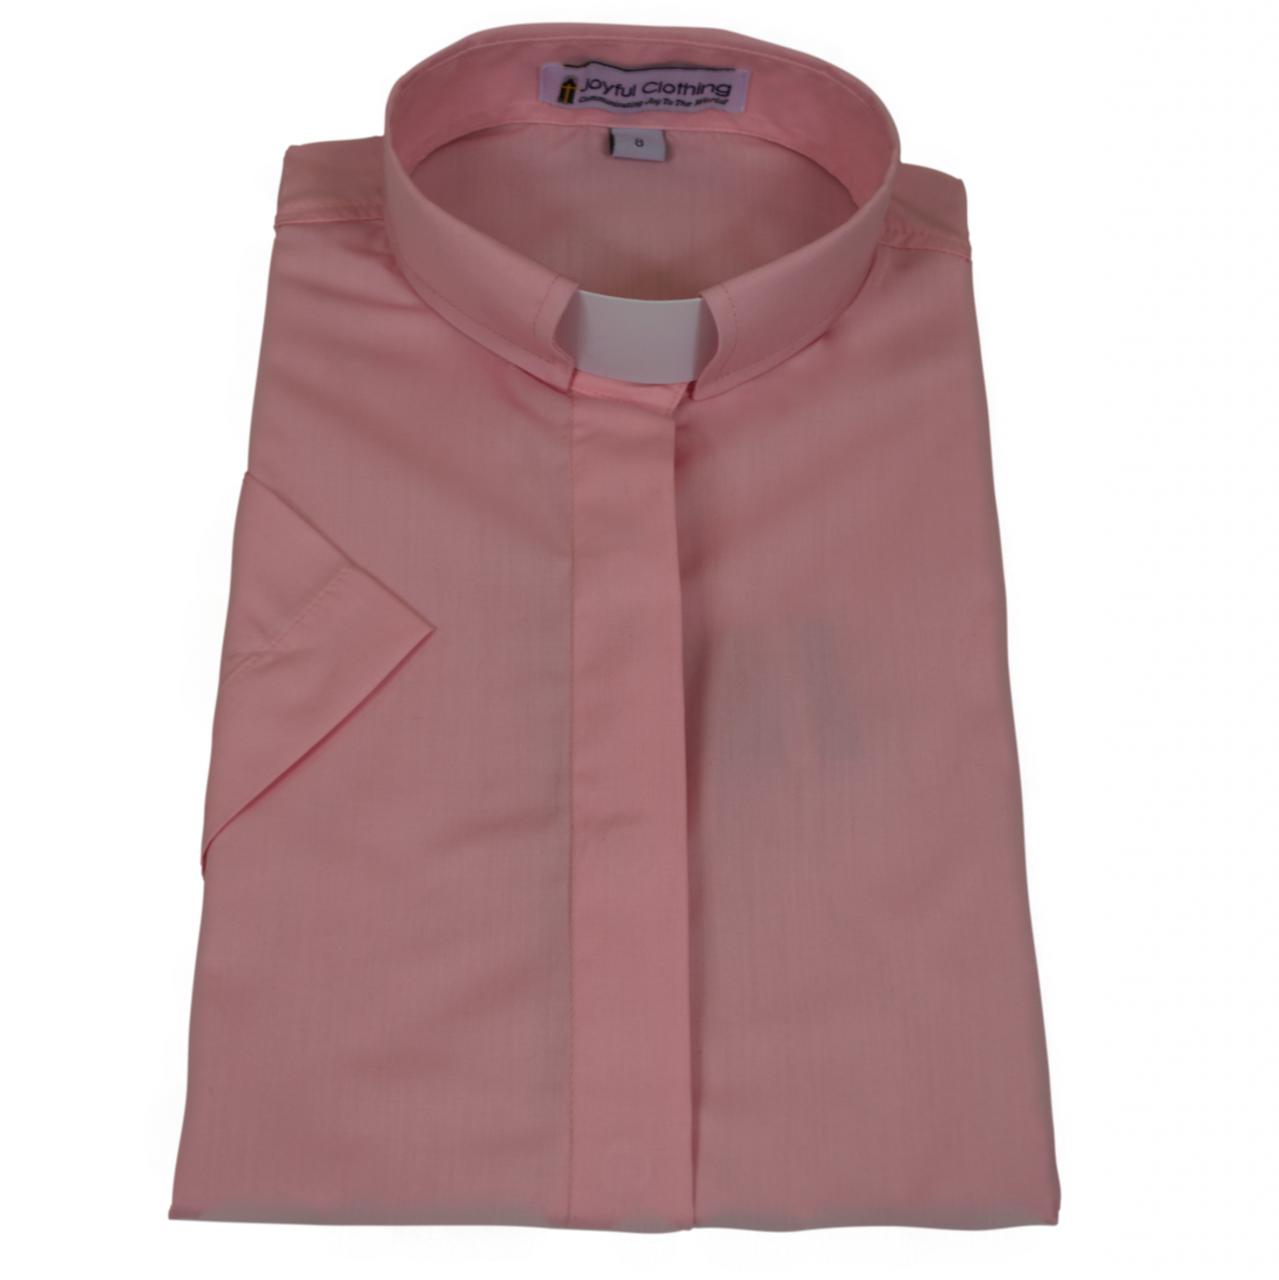 579. Women's Short-Sleeve Tab-Collar Clergy Shirt - Pink